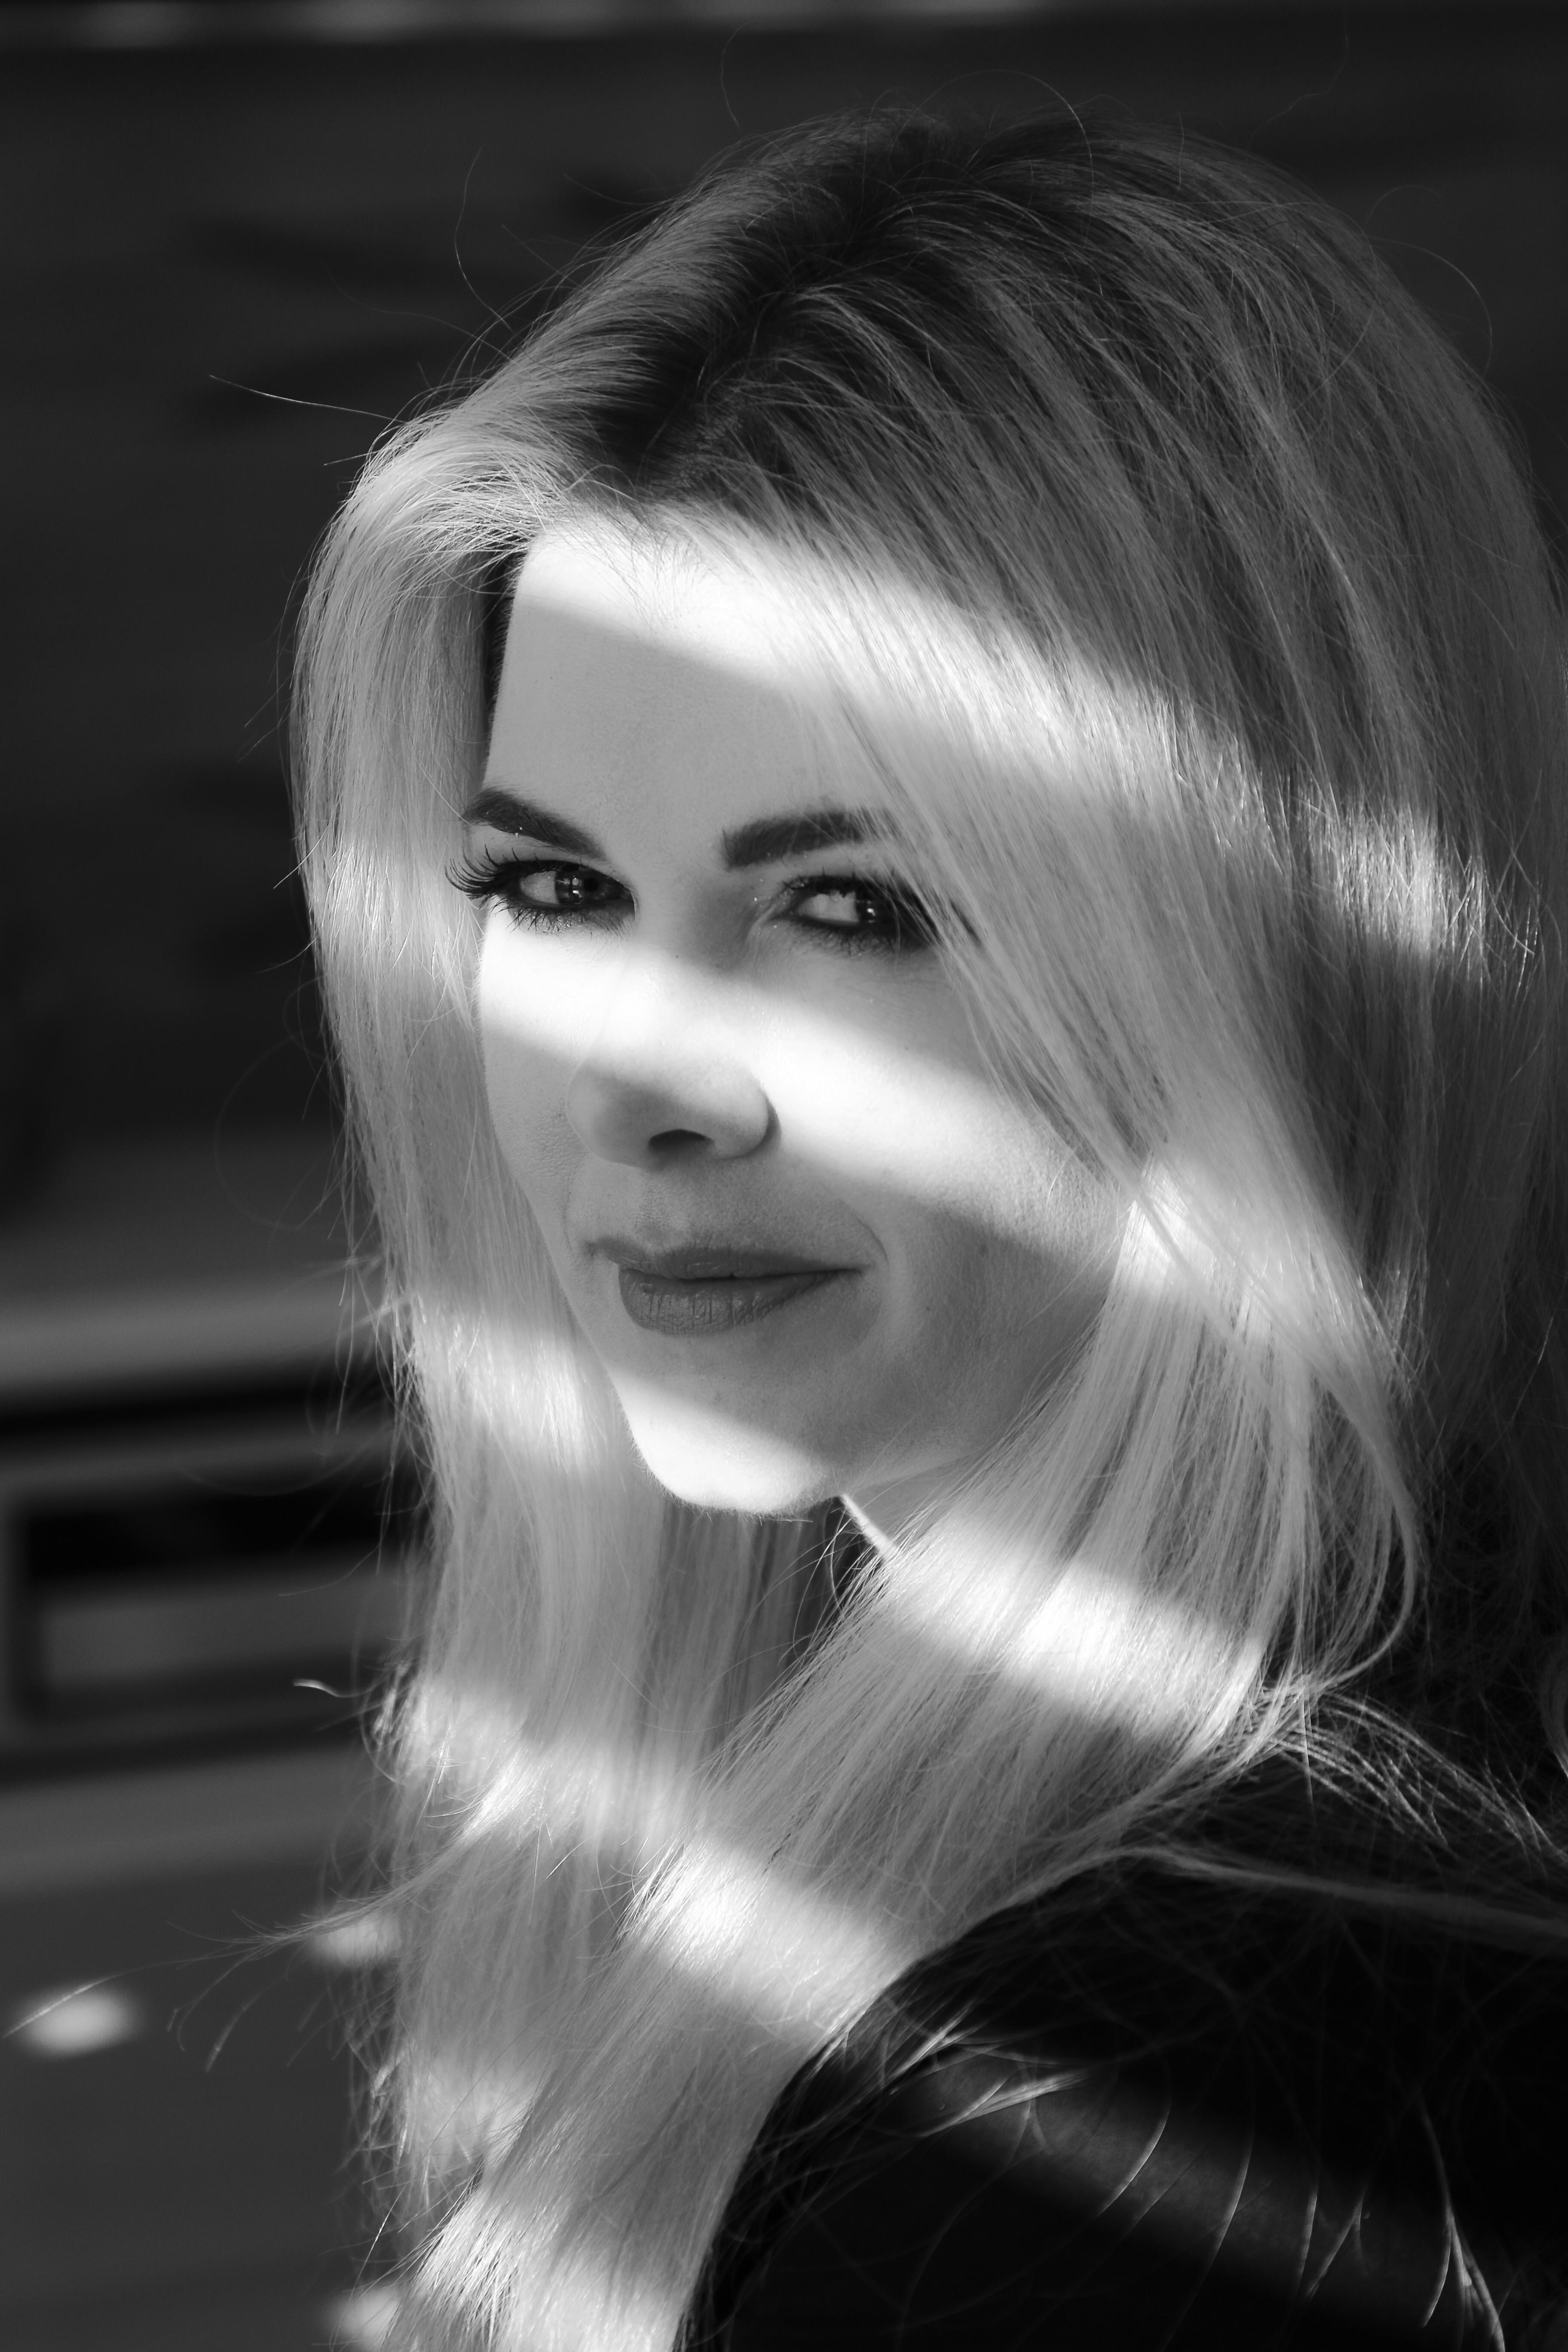 EyeCatcher_by_Pamela_Pancis-120